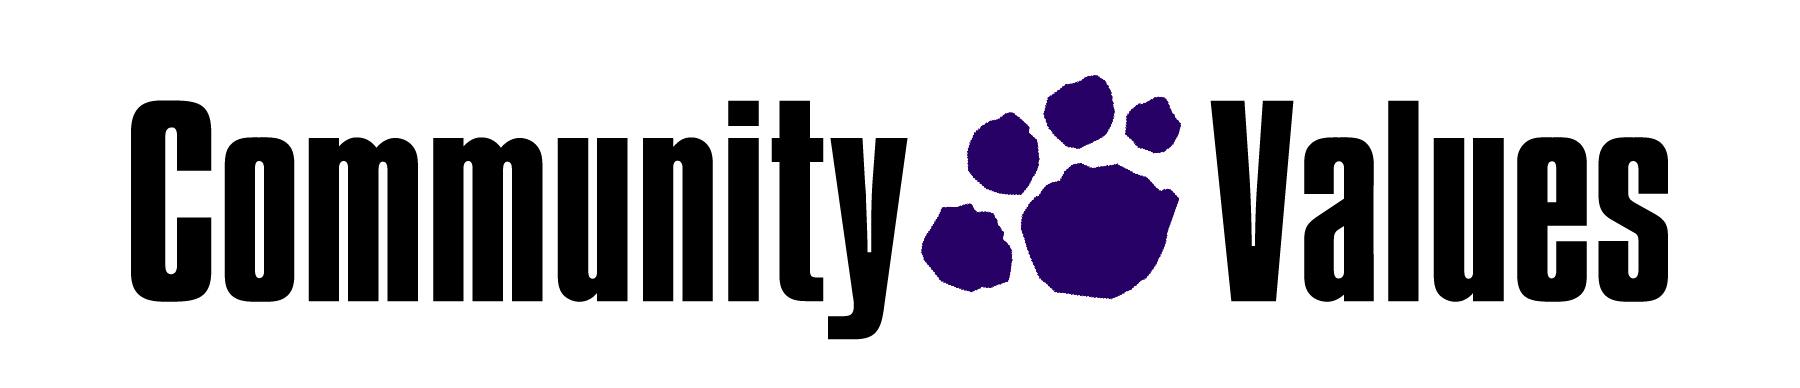 Community Values Logo